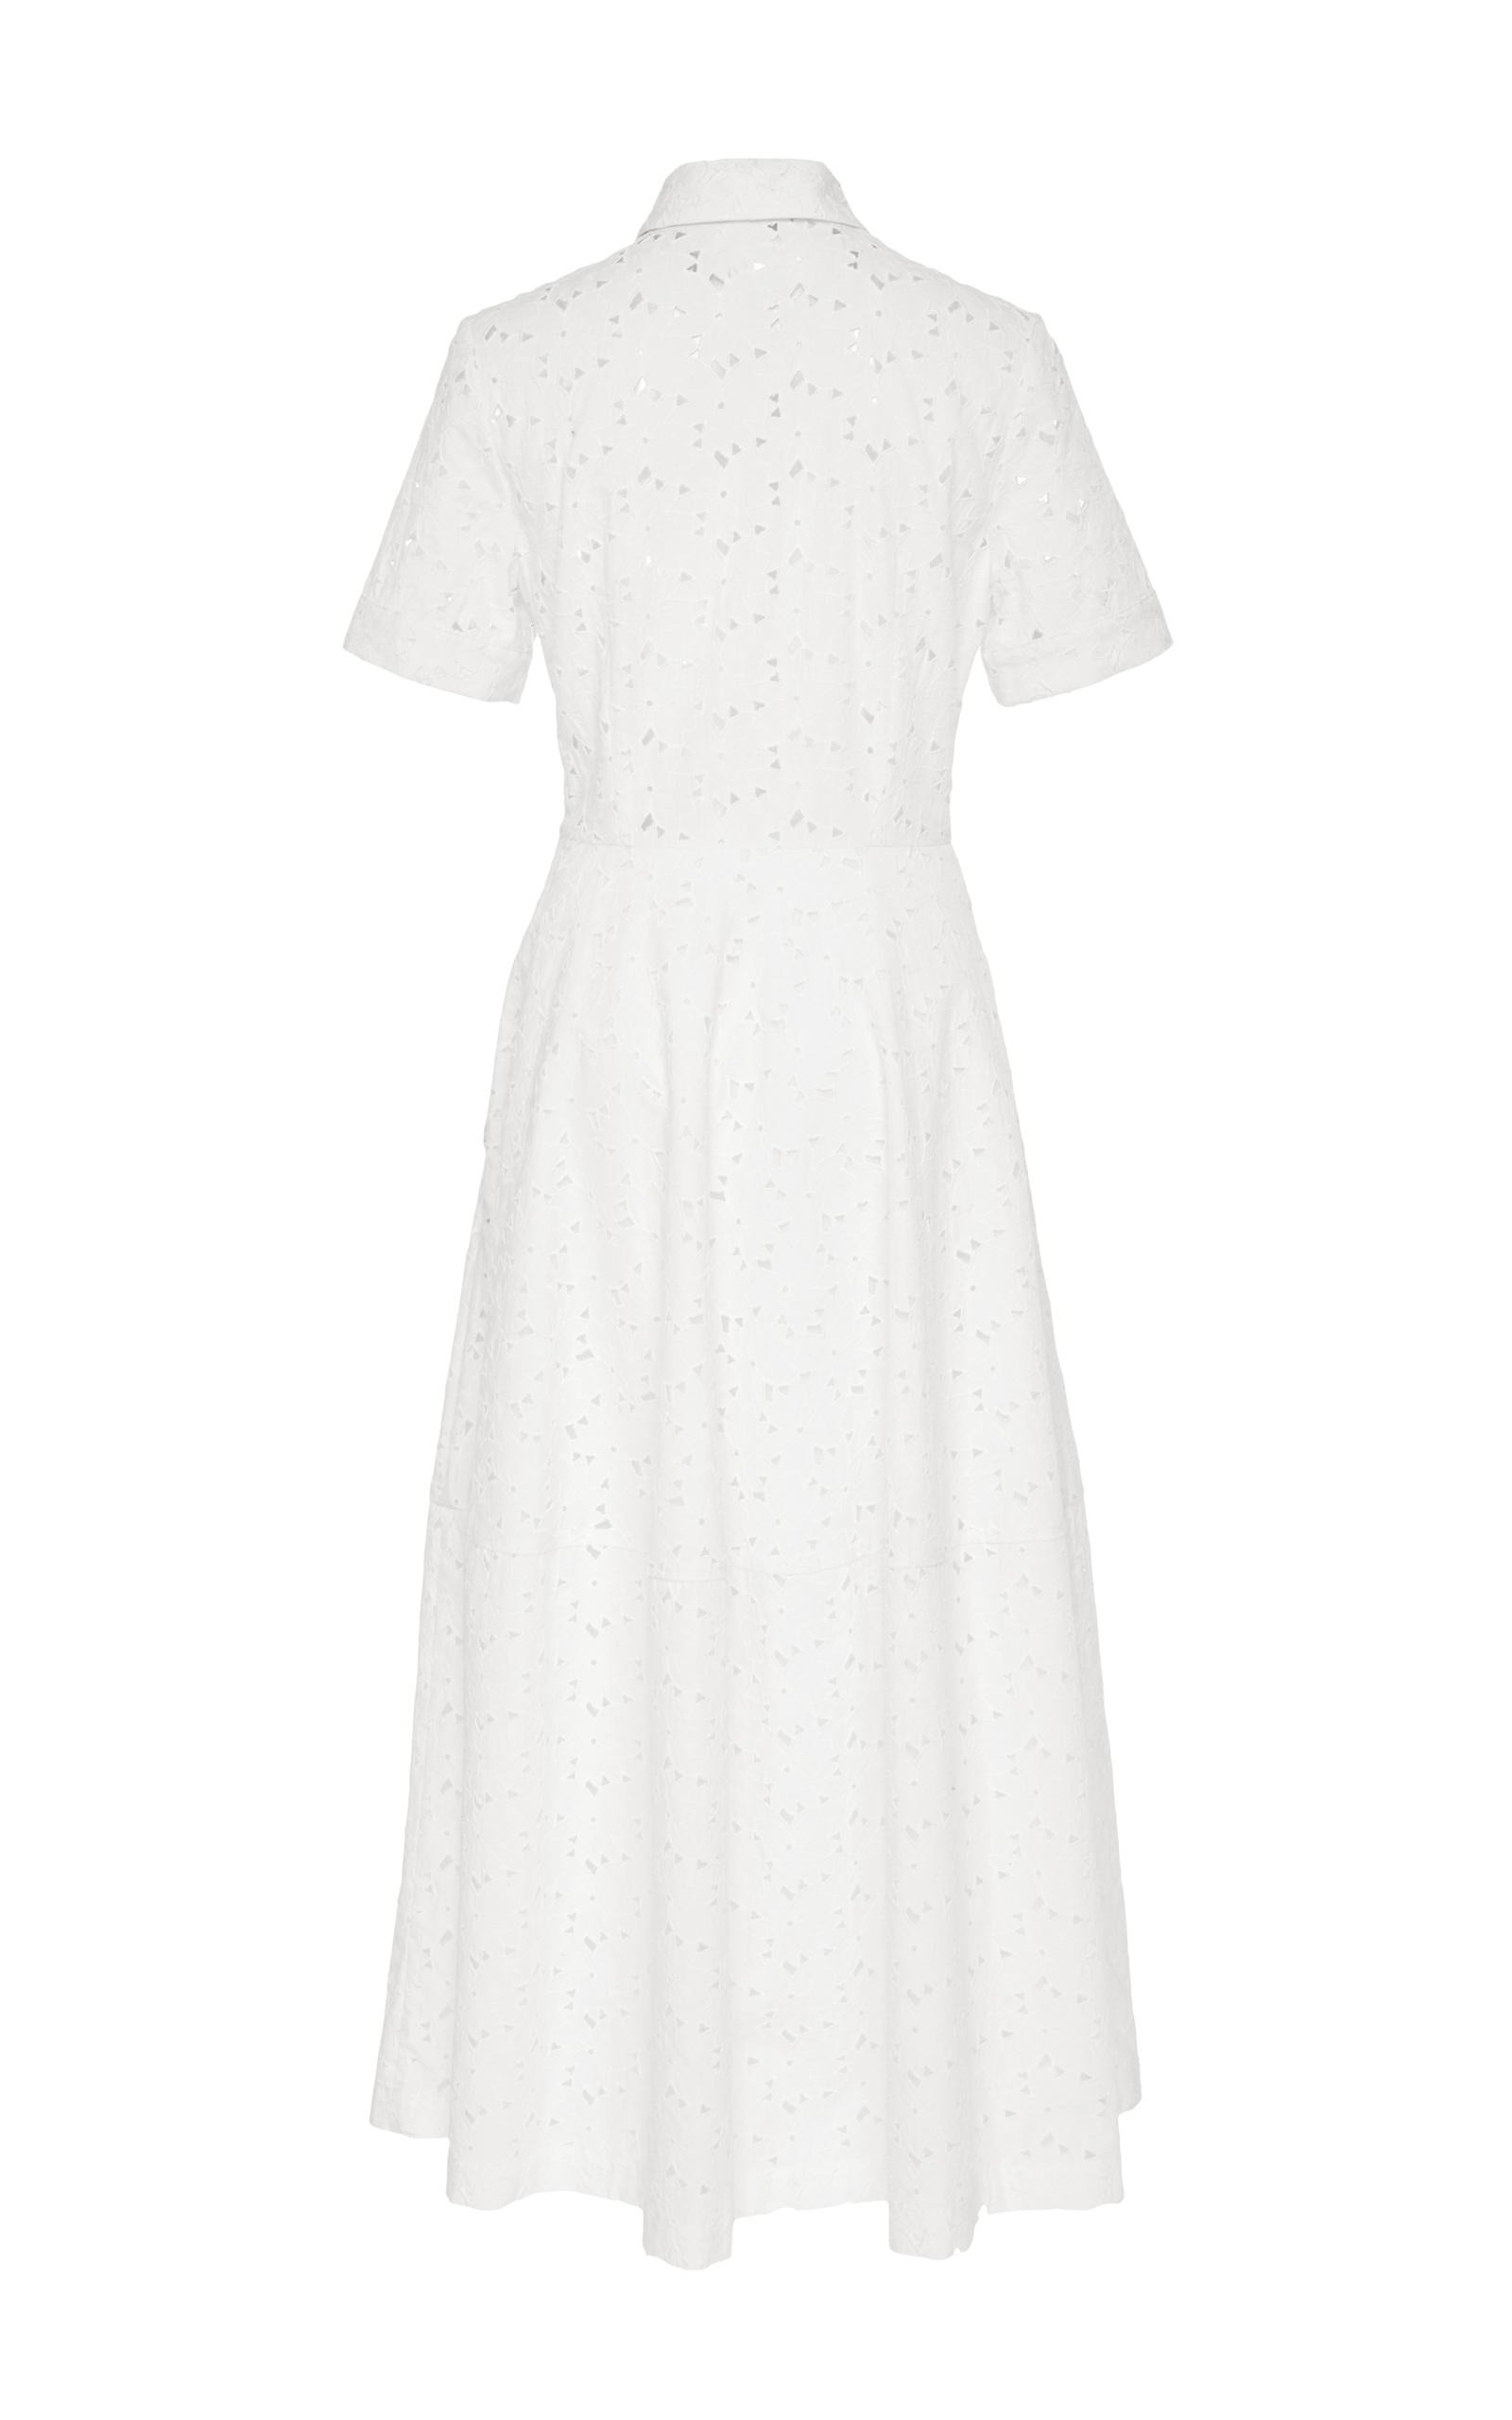 Poplin shirt dress Co Browse Sale Online New Online Clearance View Footlocker Cheap Online Wholesale Price aTN9iWF82